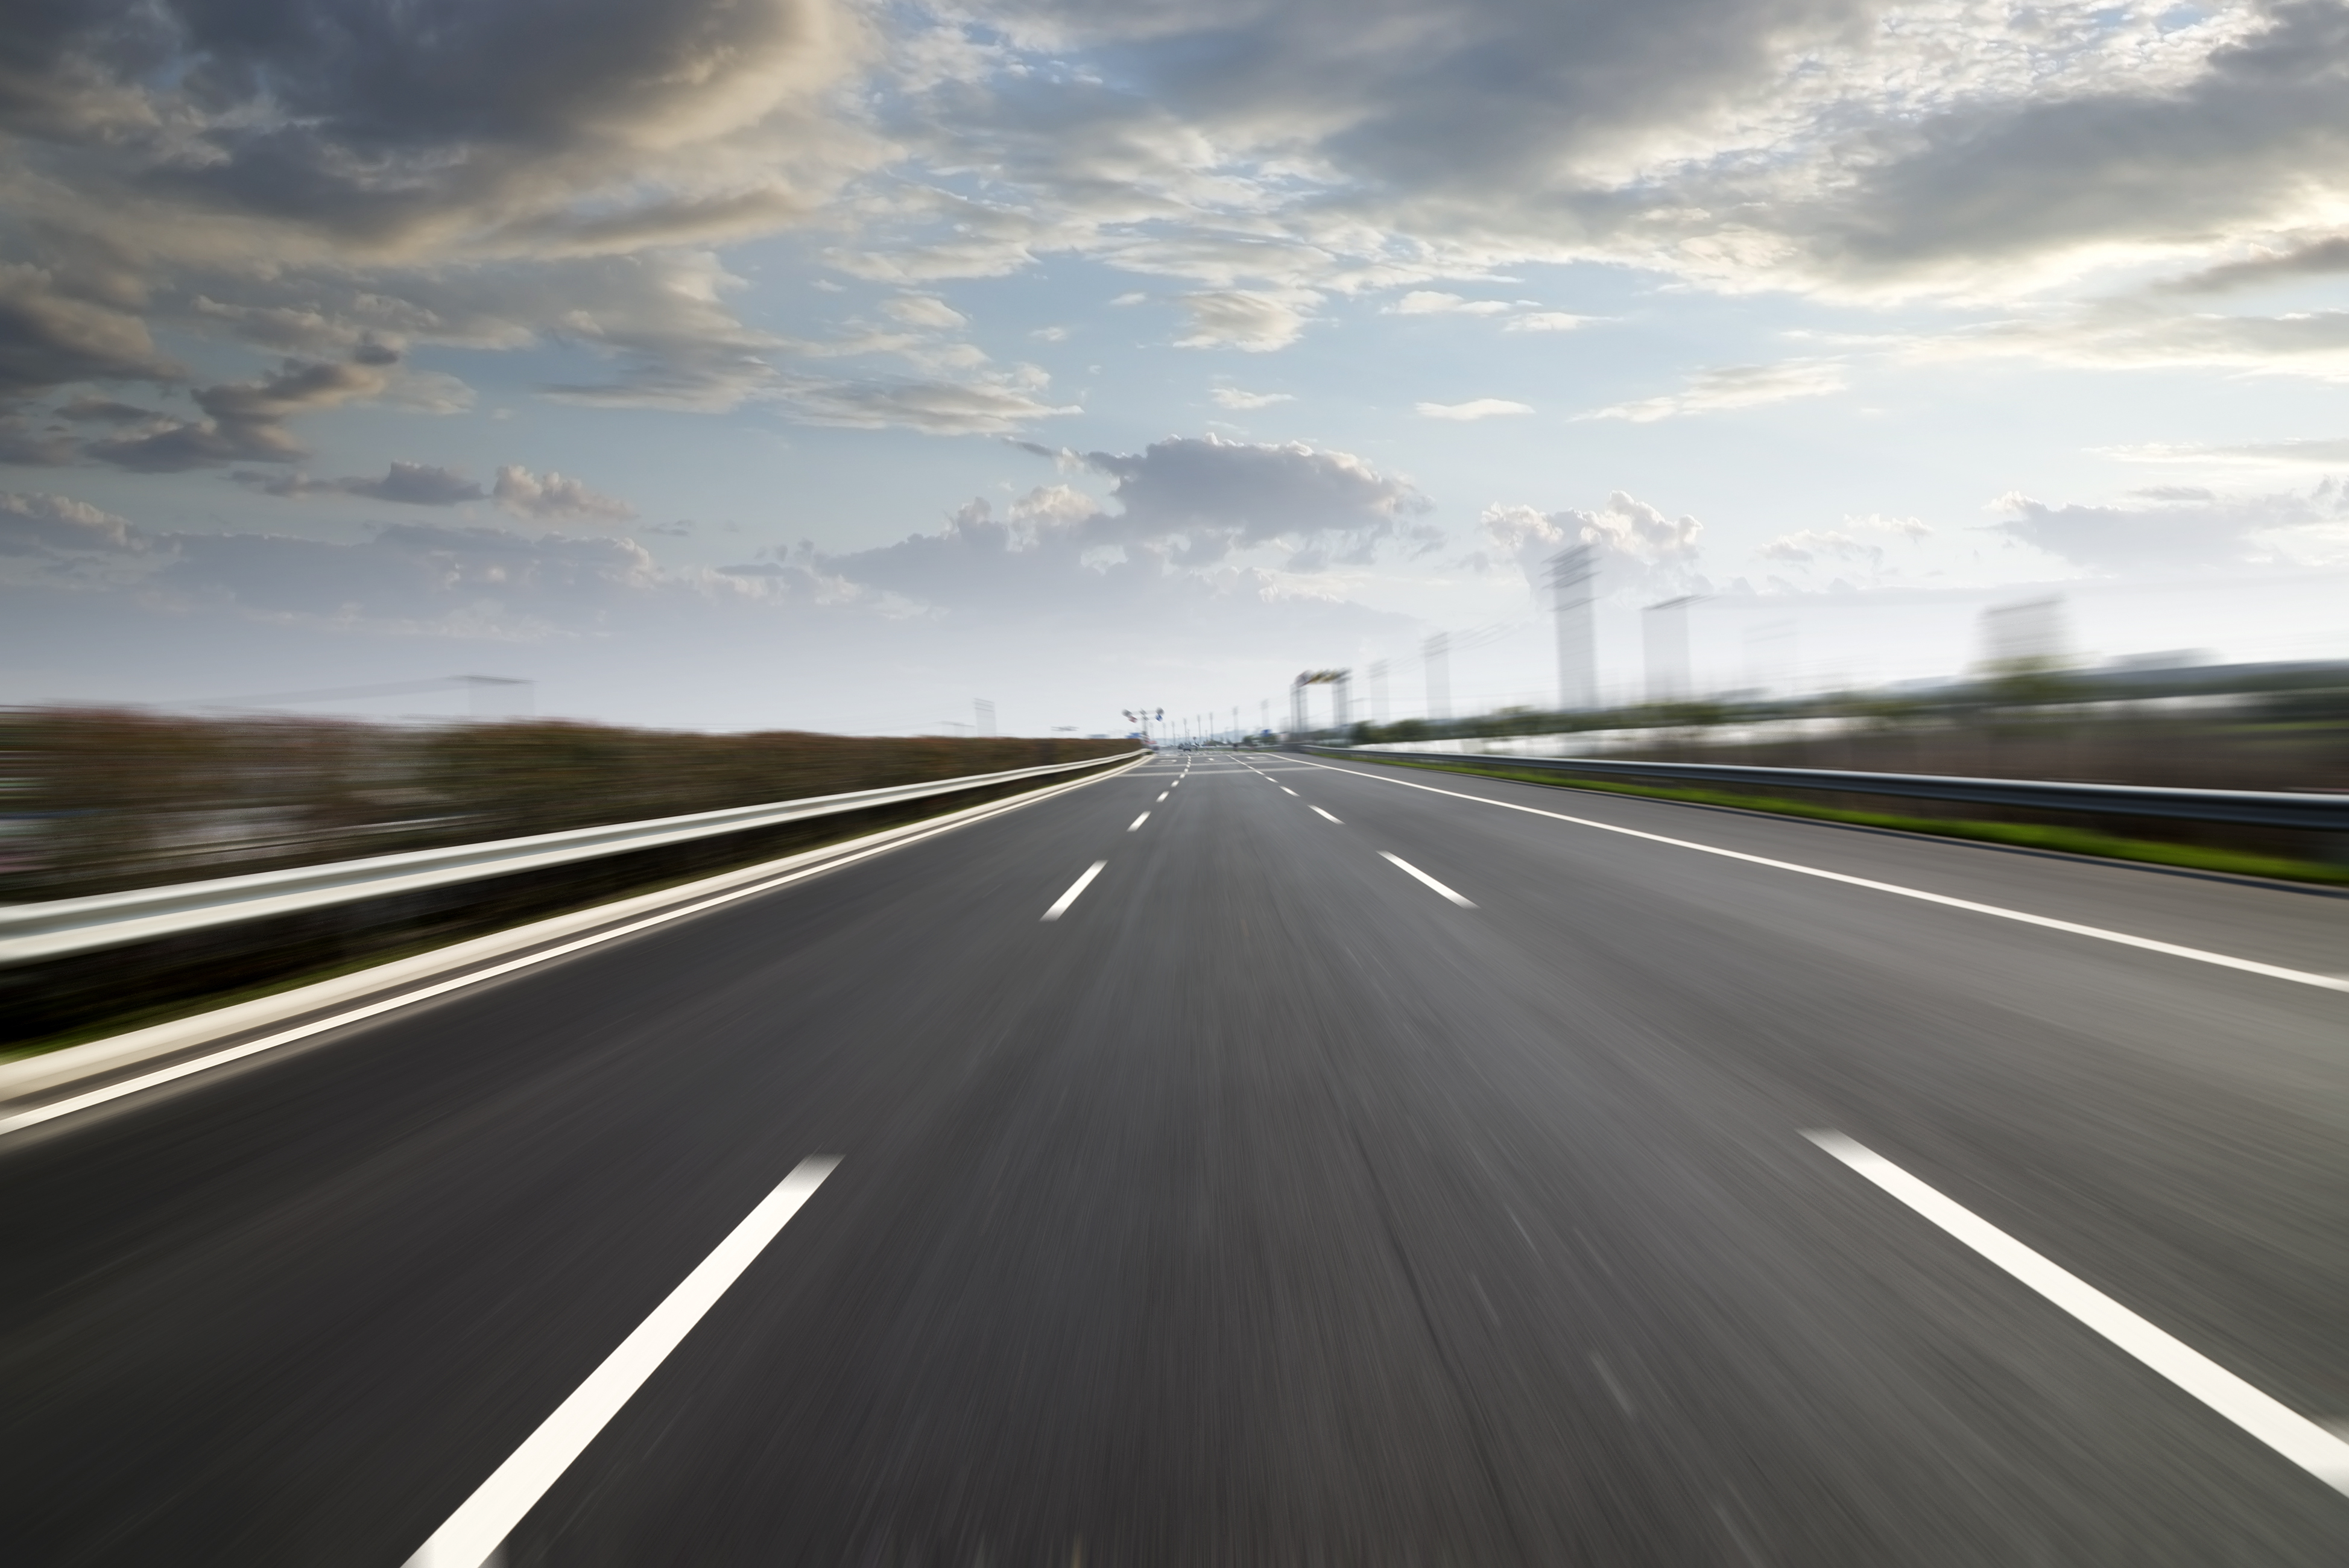 A1 cortada em ambos os sentidos entre Albergaria e Aveiro-Sul